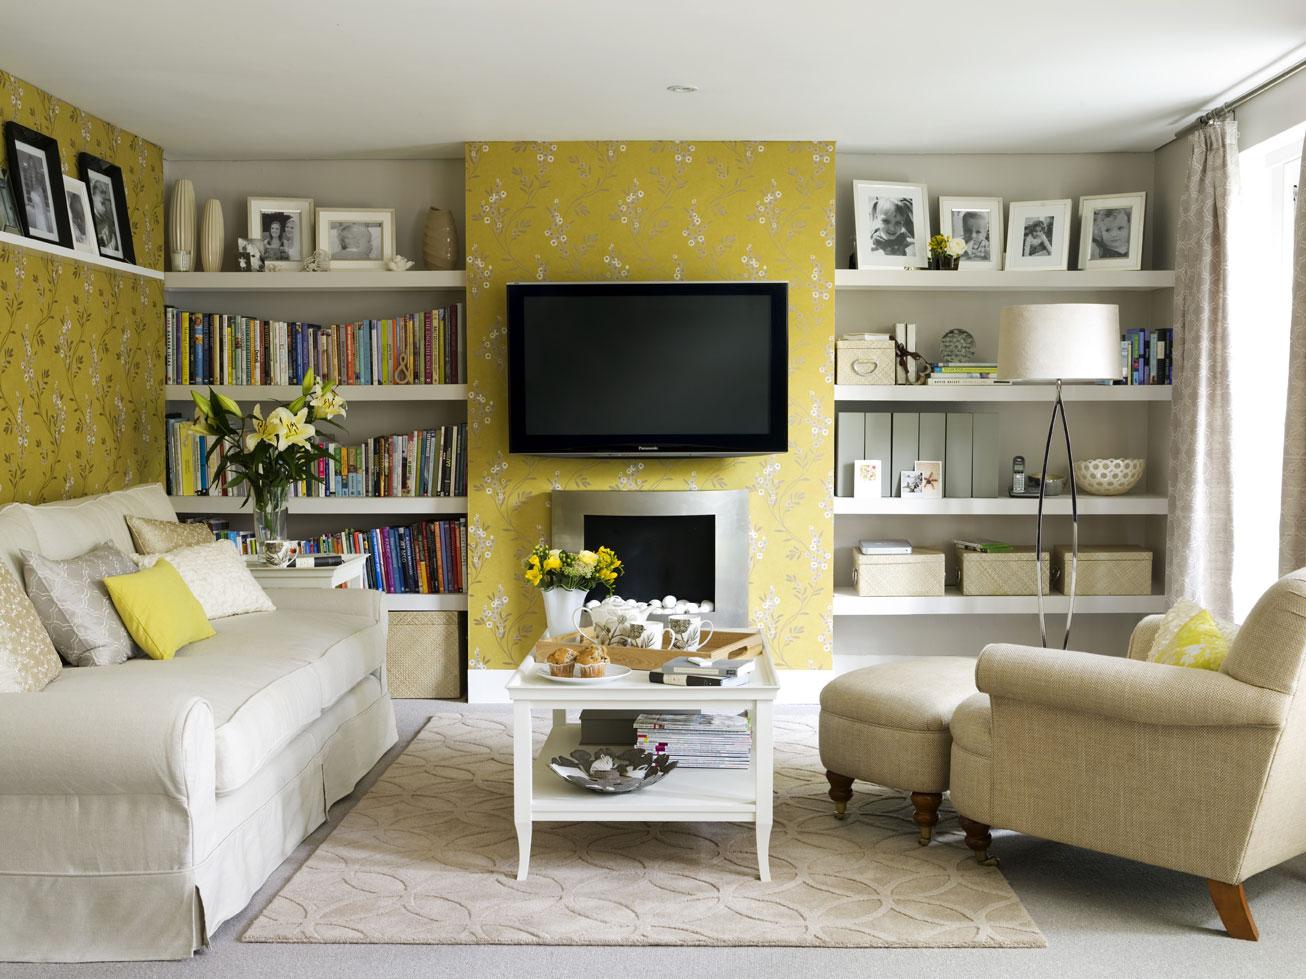 Papel de parede para sala de estar parede amarela